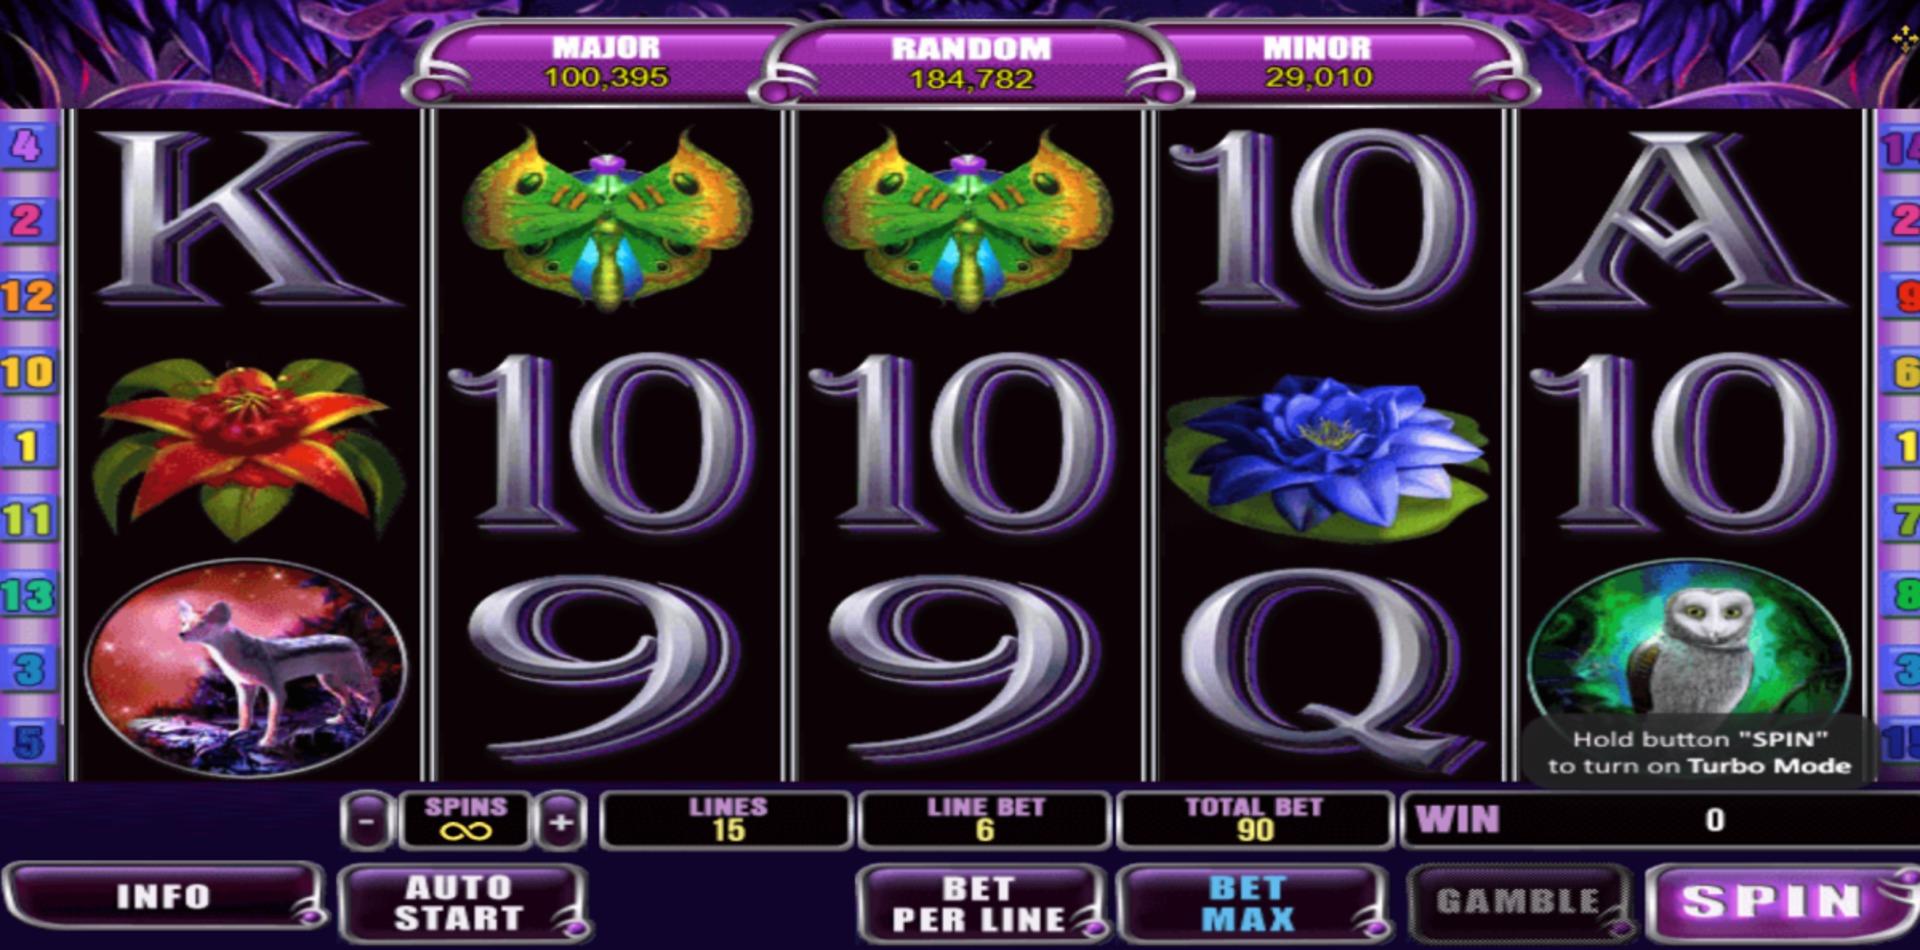 mtammy - Daftar-Slot-Online-Di-Agen-Joker123